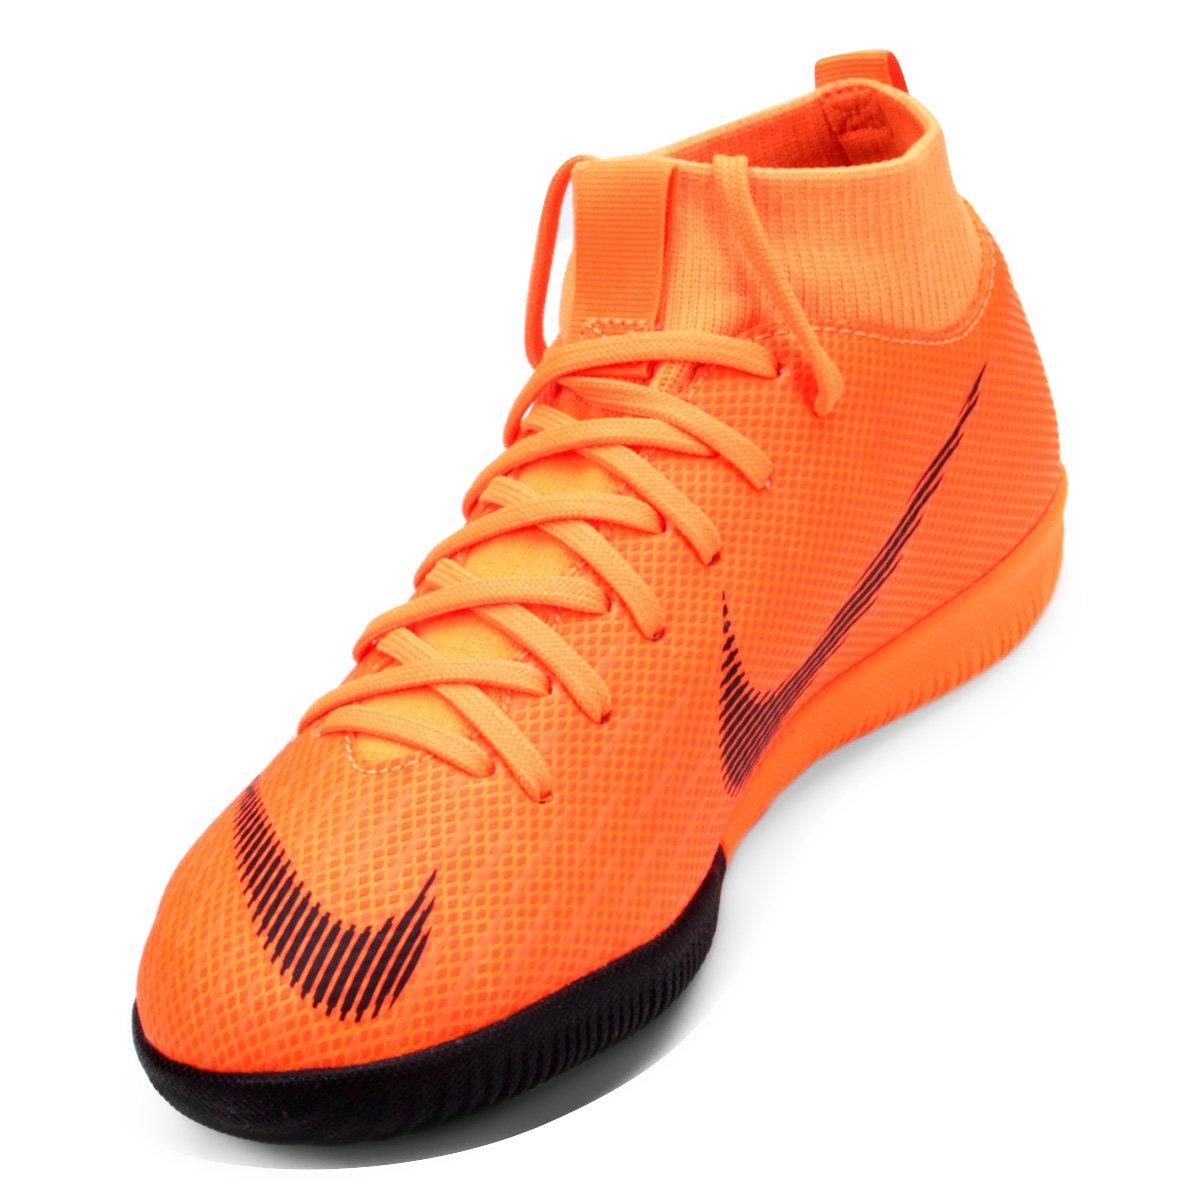 Chuteira Futsal Infantil Nike Mercurial Superfly 6 Academy - Laranja ... 9276b2554ea88